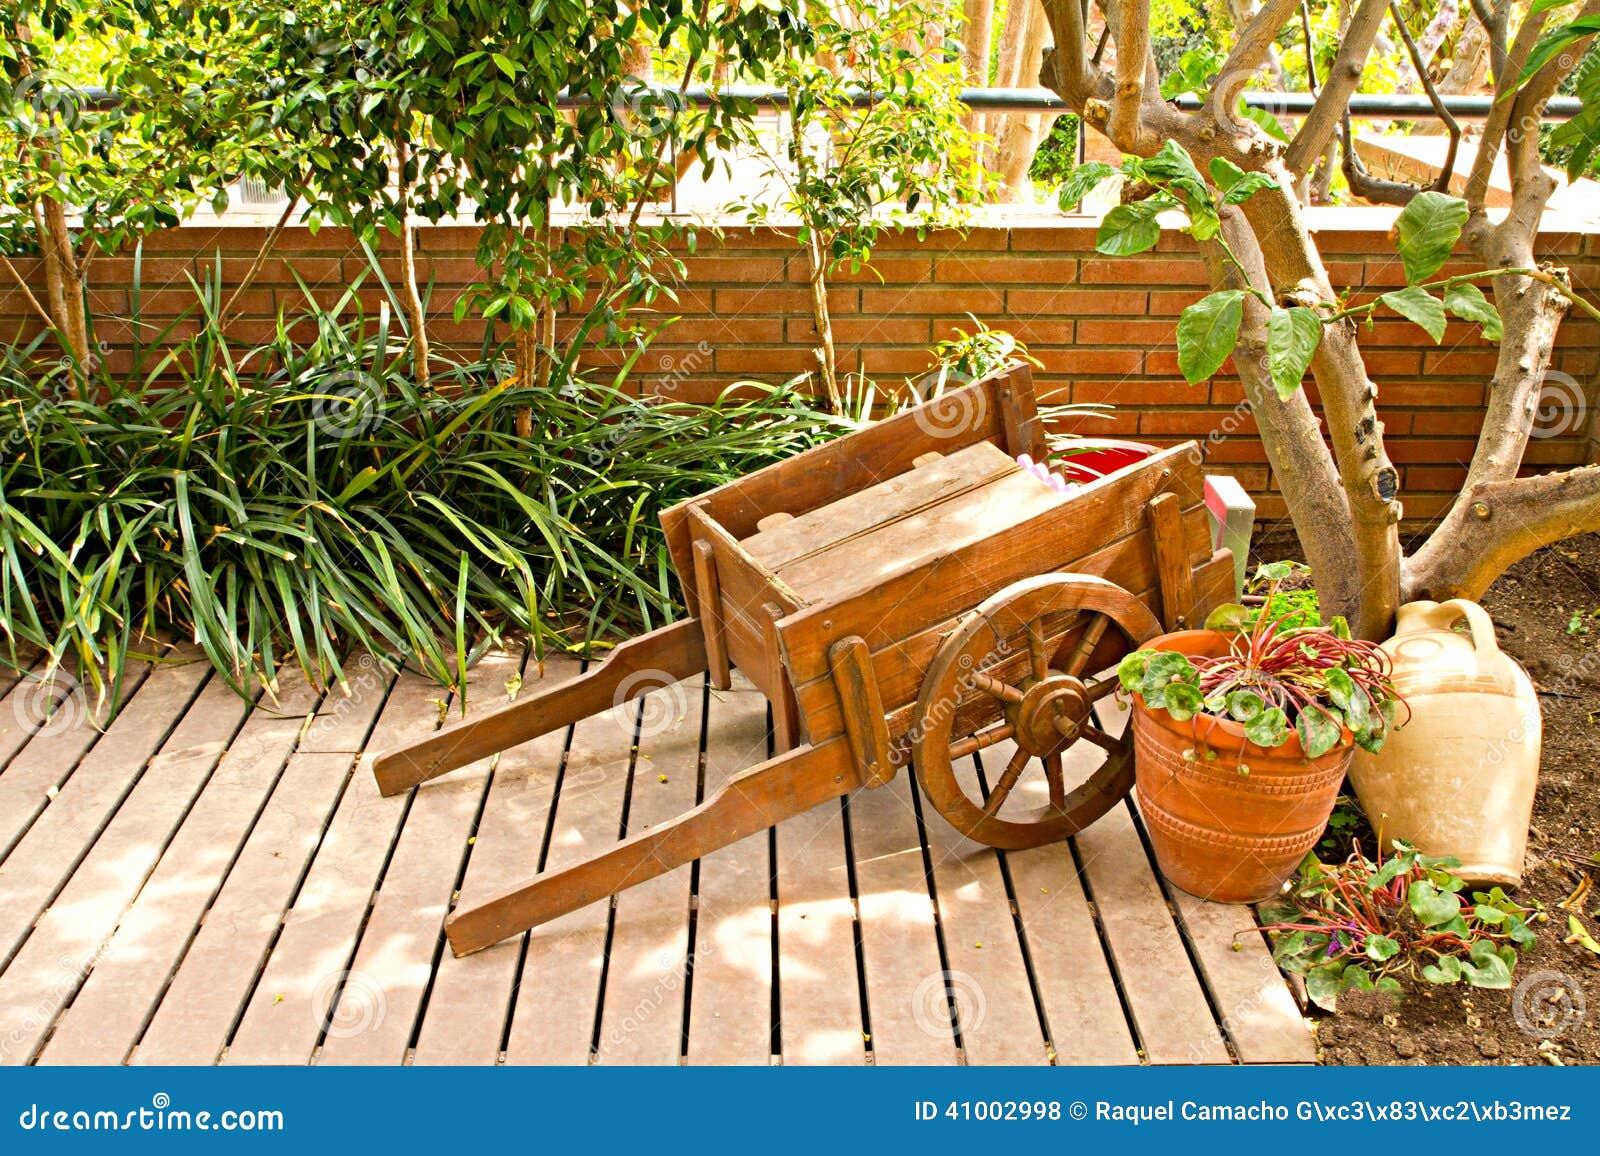 Wooden garden cart stock photo. Image of green, wagon - 41002998